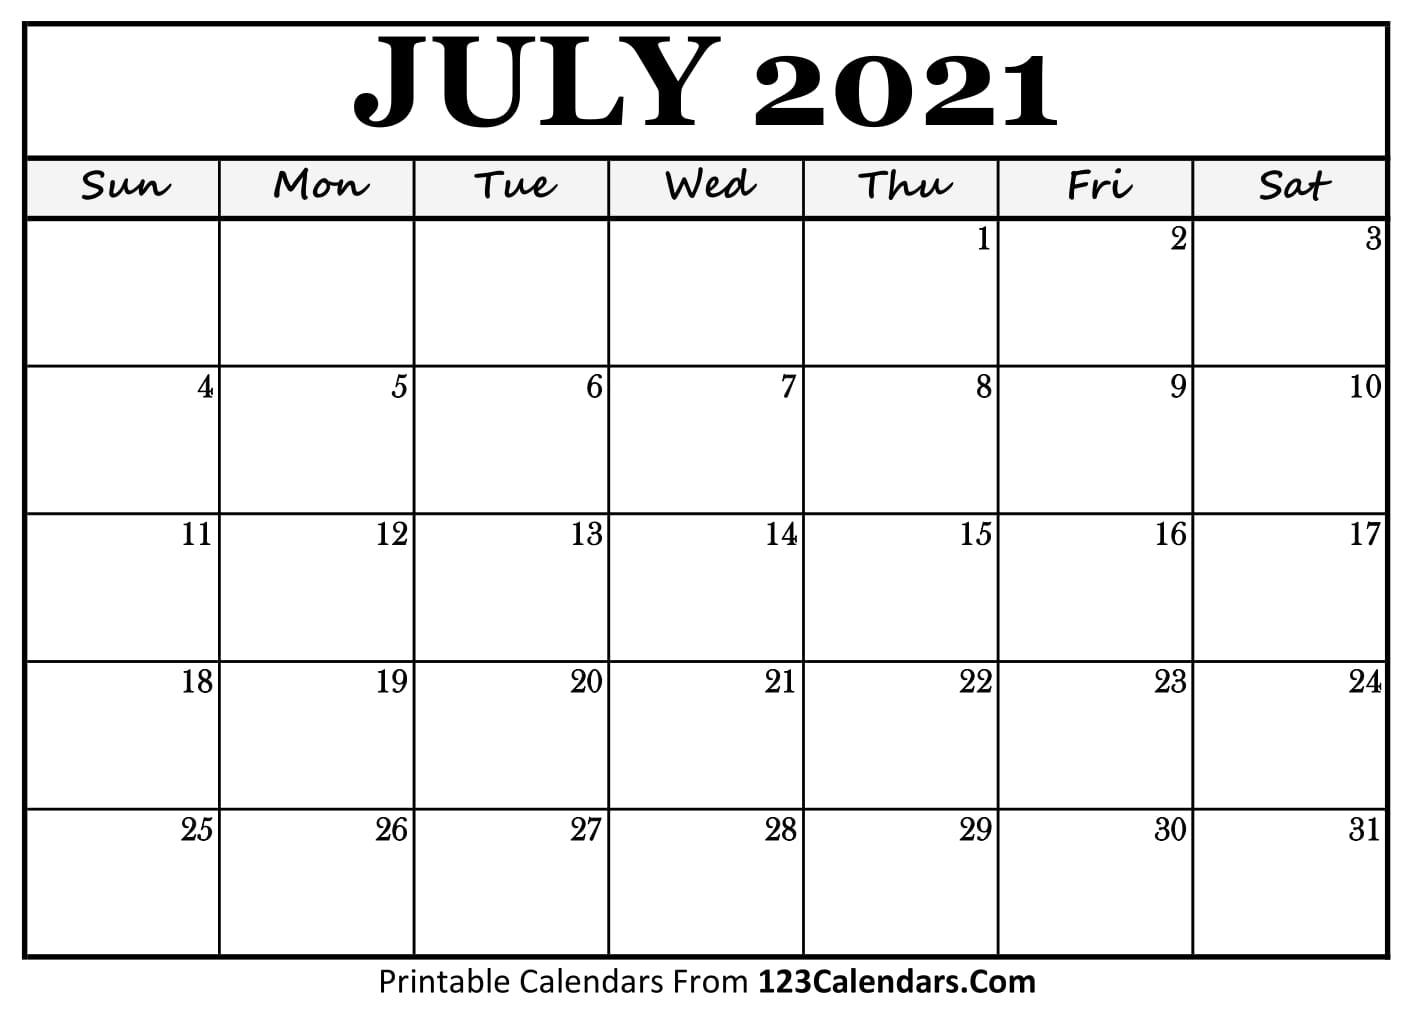 Printable July 2021 Calendar Templates | 123Calendars